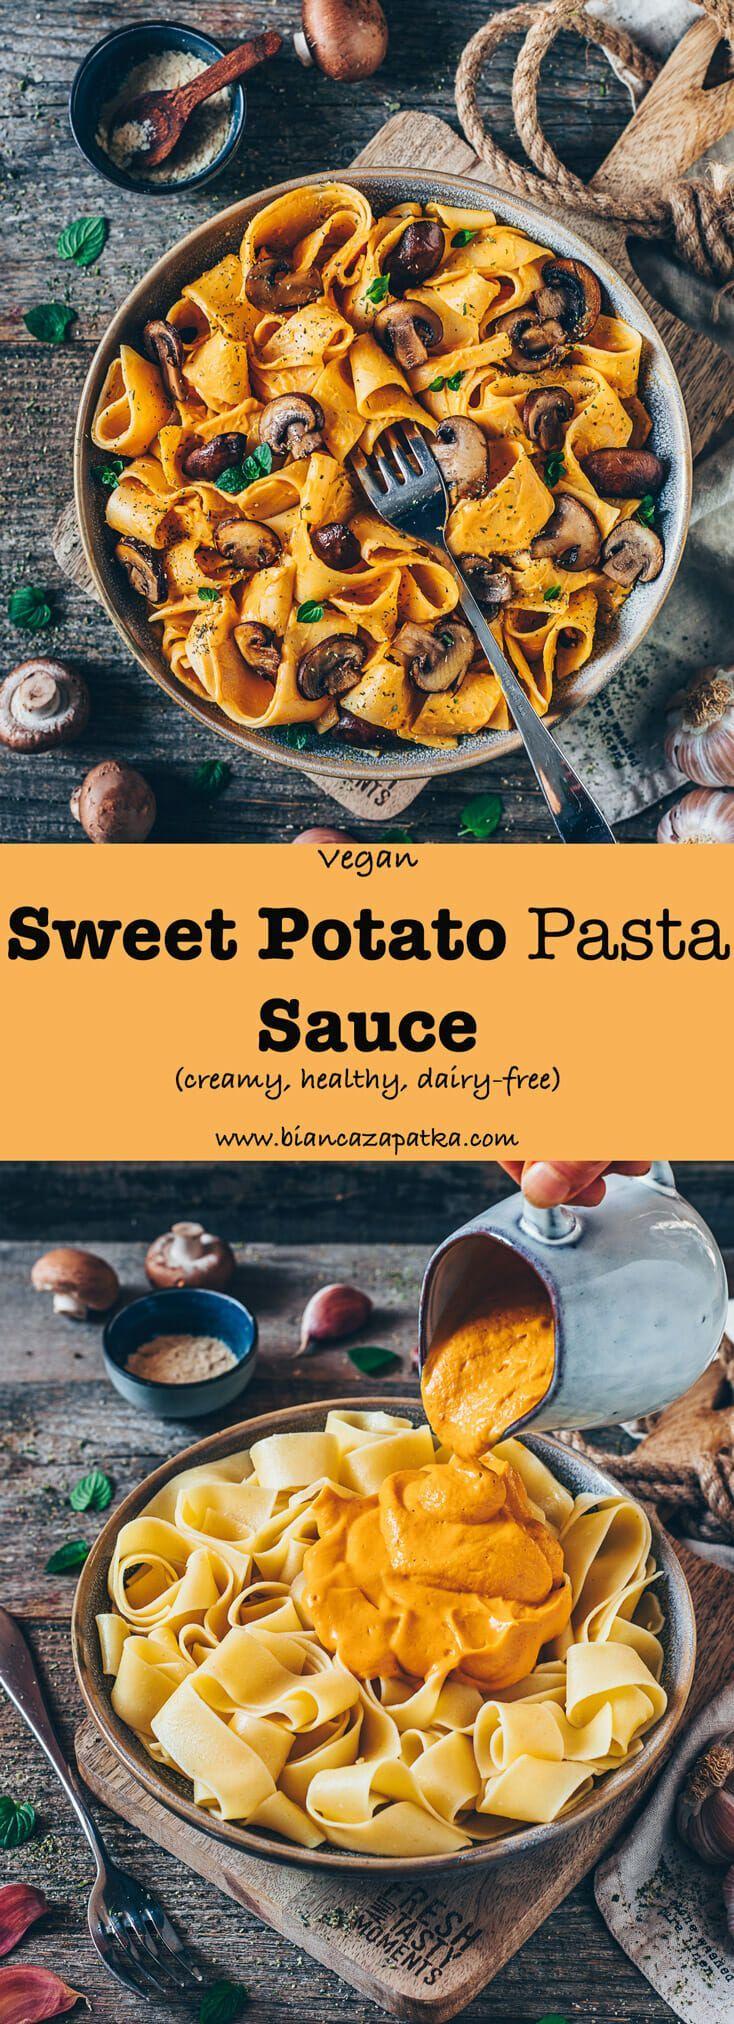 Photo of Vegan Sweet Potato Pasta Sauce (creamy, cheesy) – Bianca Zapatka | Recipes